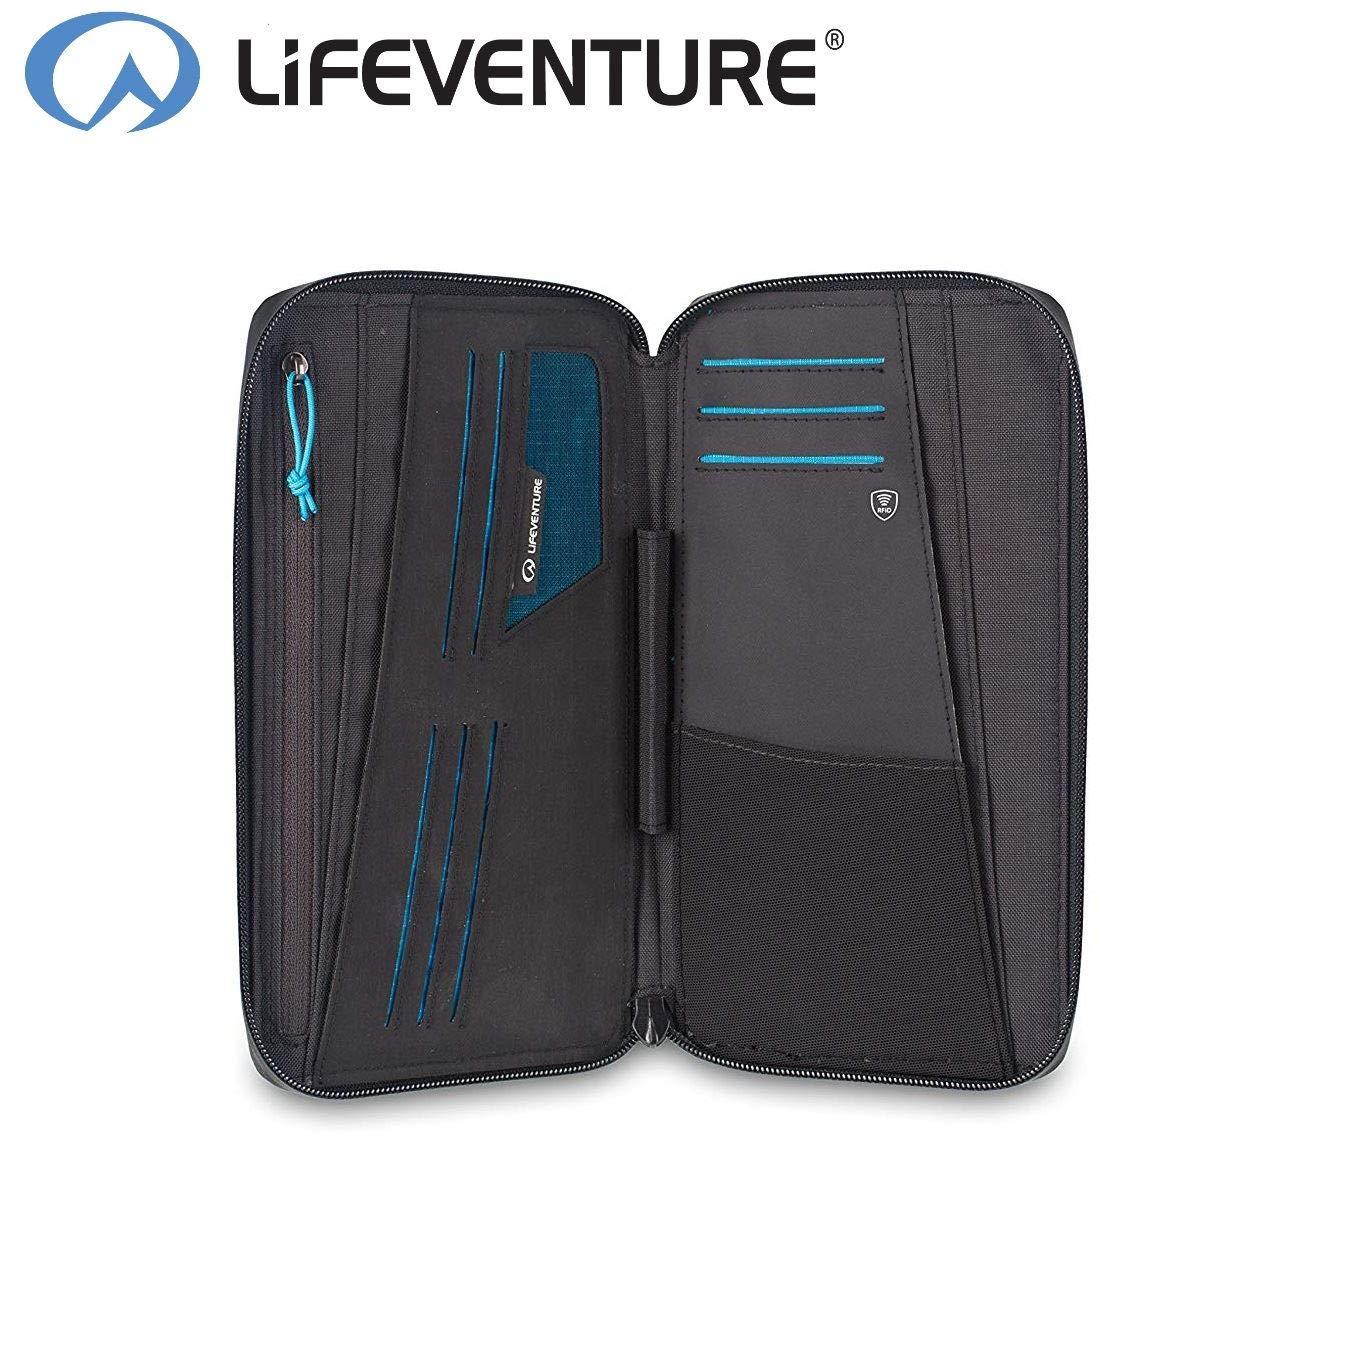 86b49cfe2536 Amazon.com : Life Venture Rfid Travel Wallet : Sports & Outdoors